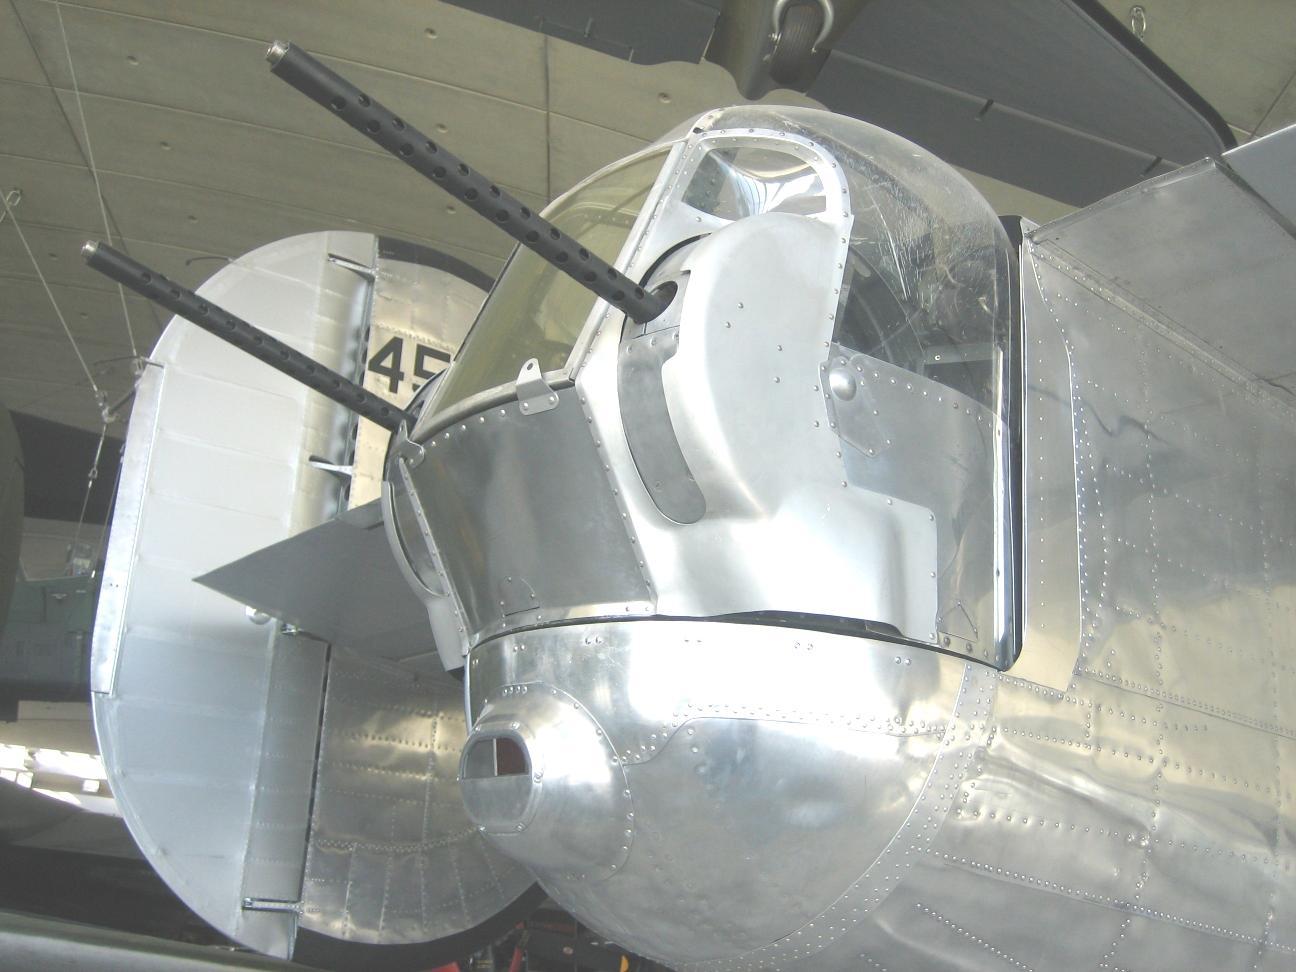 B 24 Ball Turret File:B24 tail t...